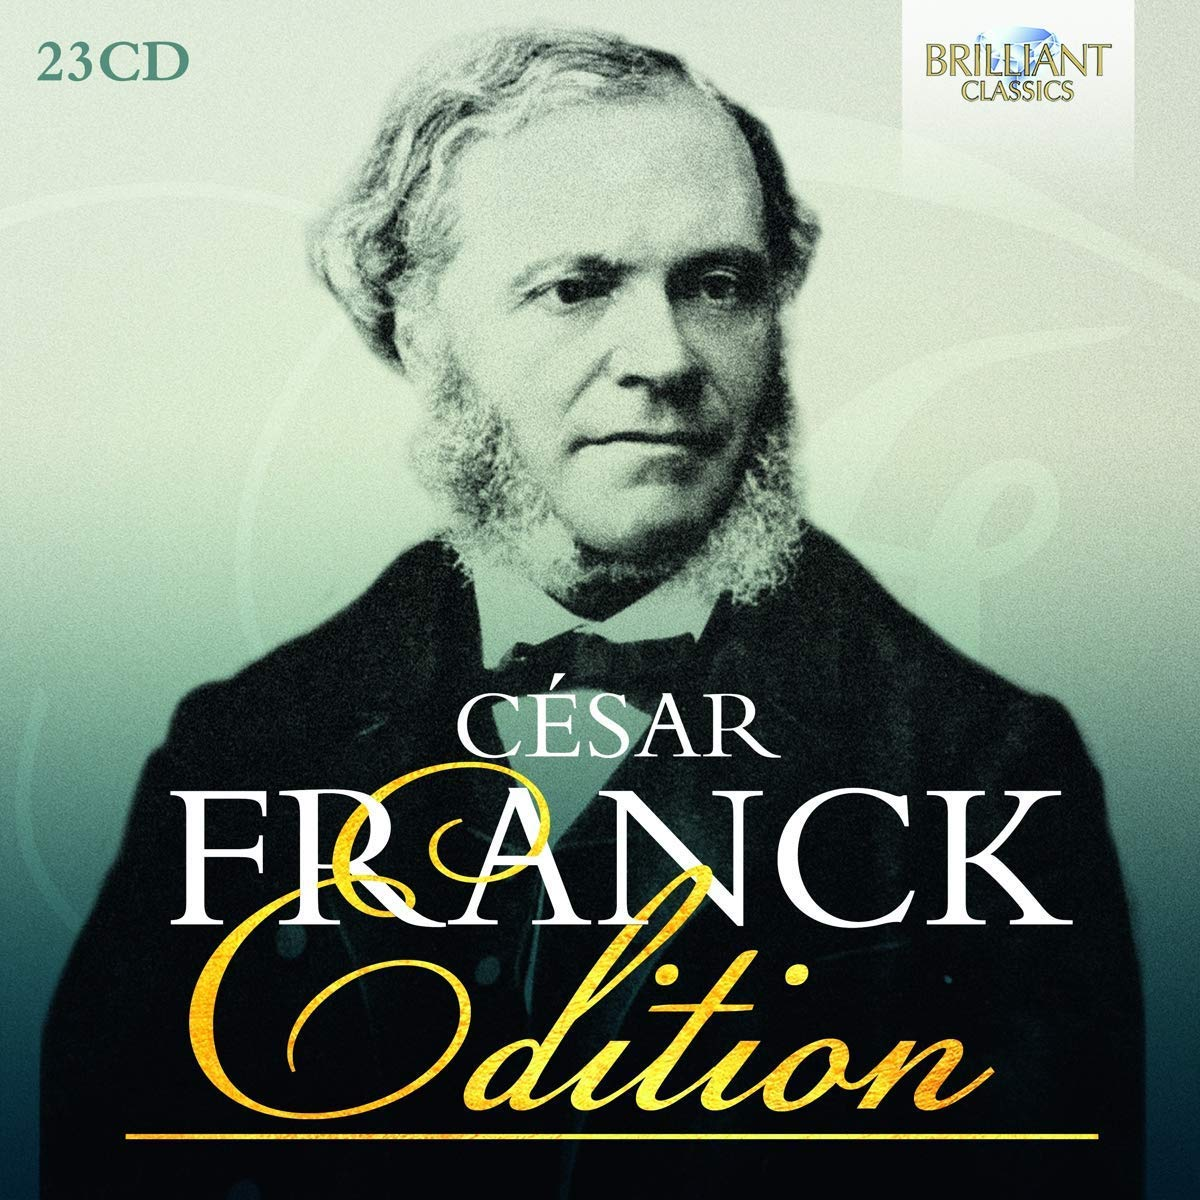 Cesar Franck Edition by BRILLIANT CLASSICS